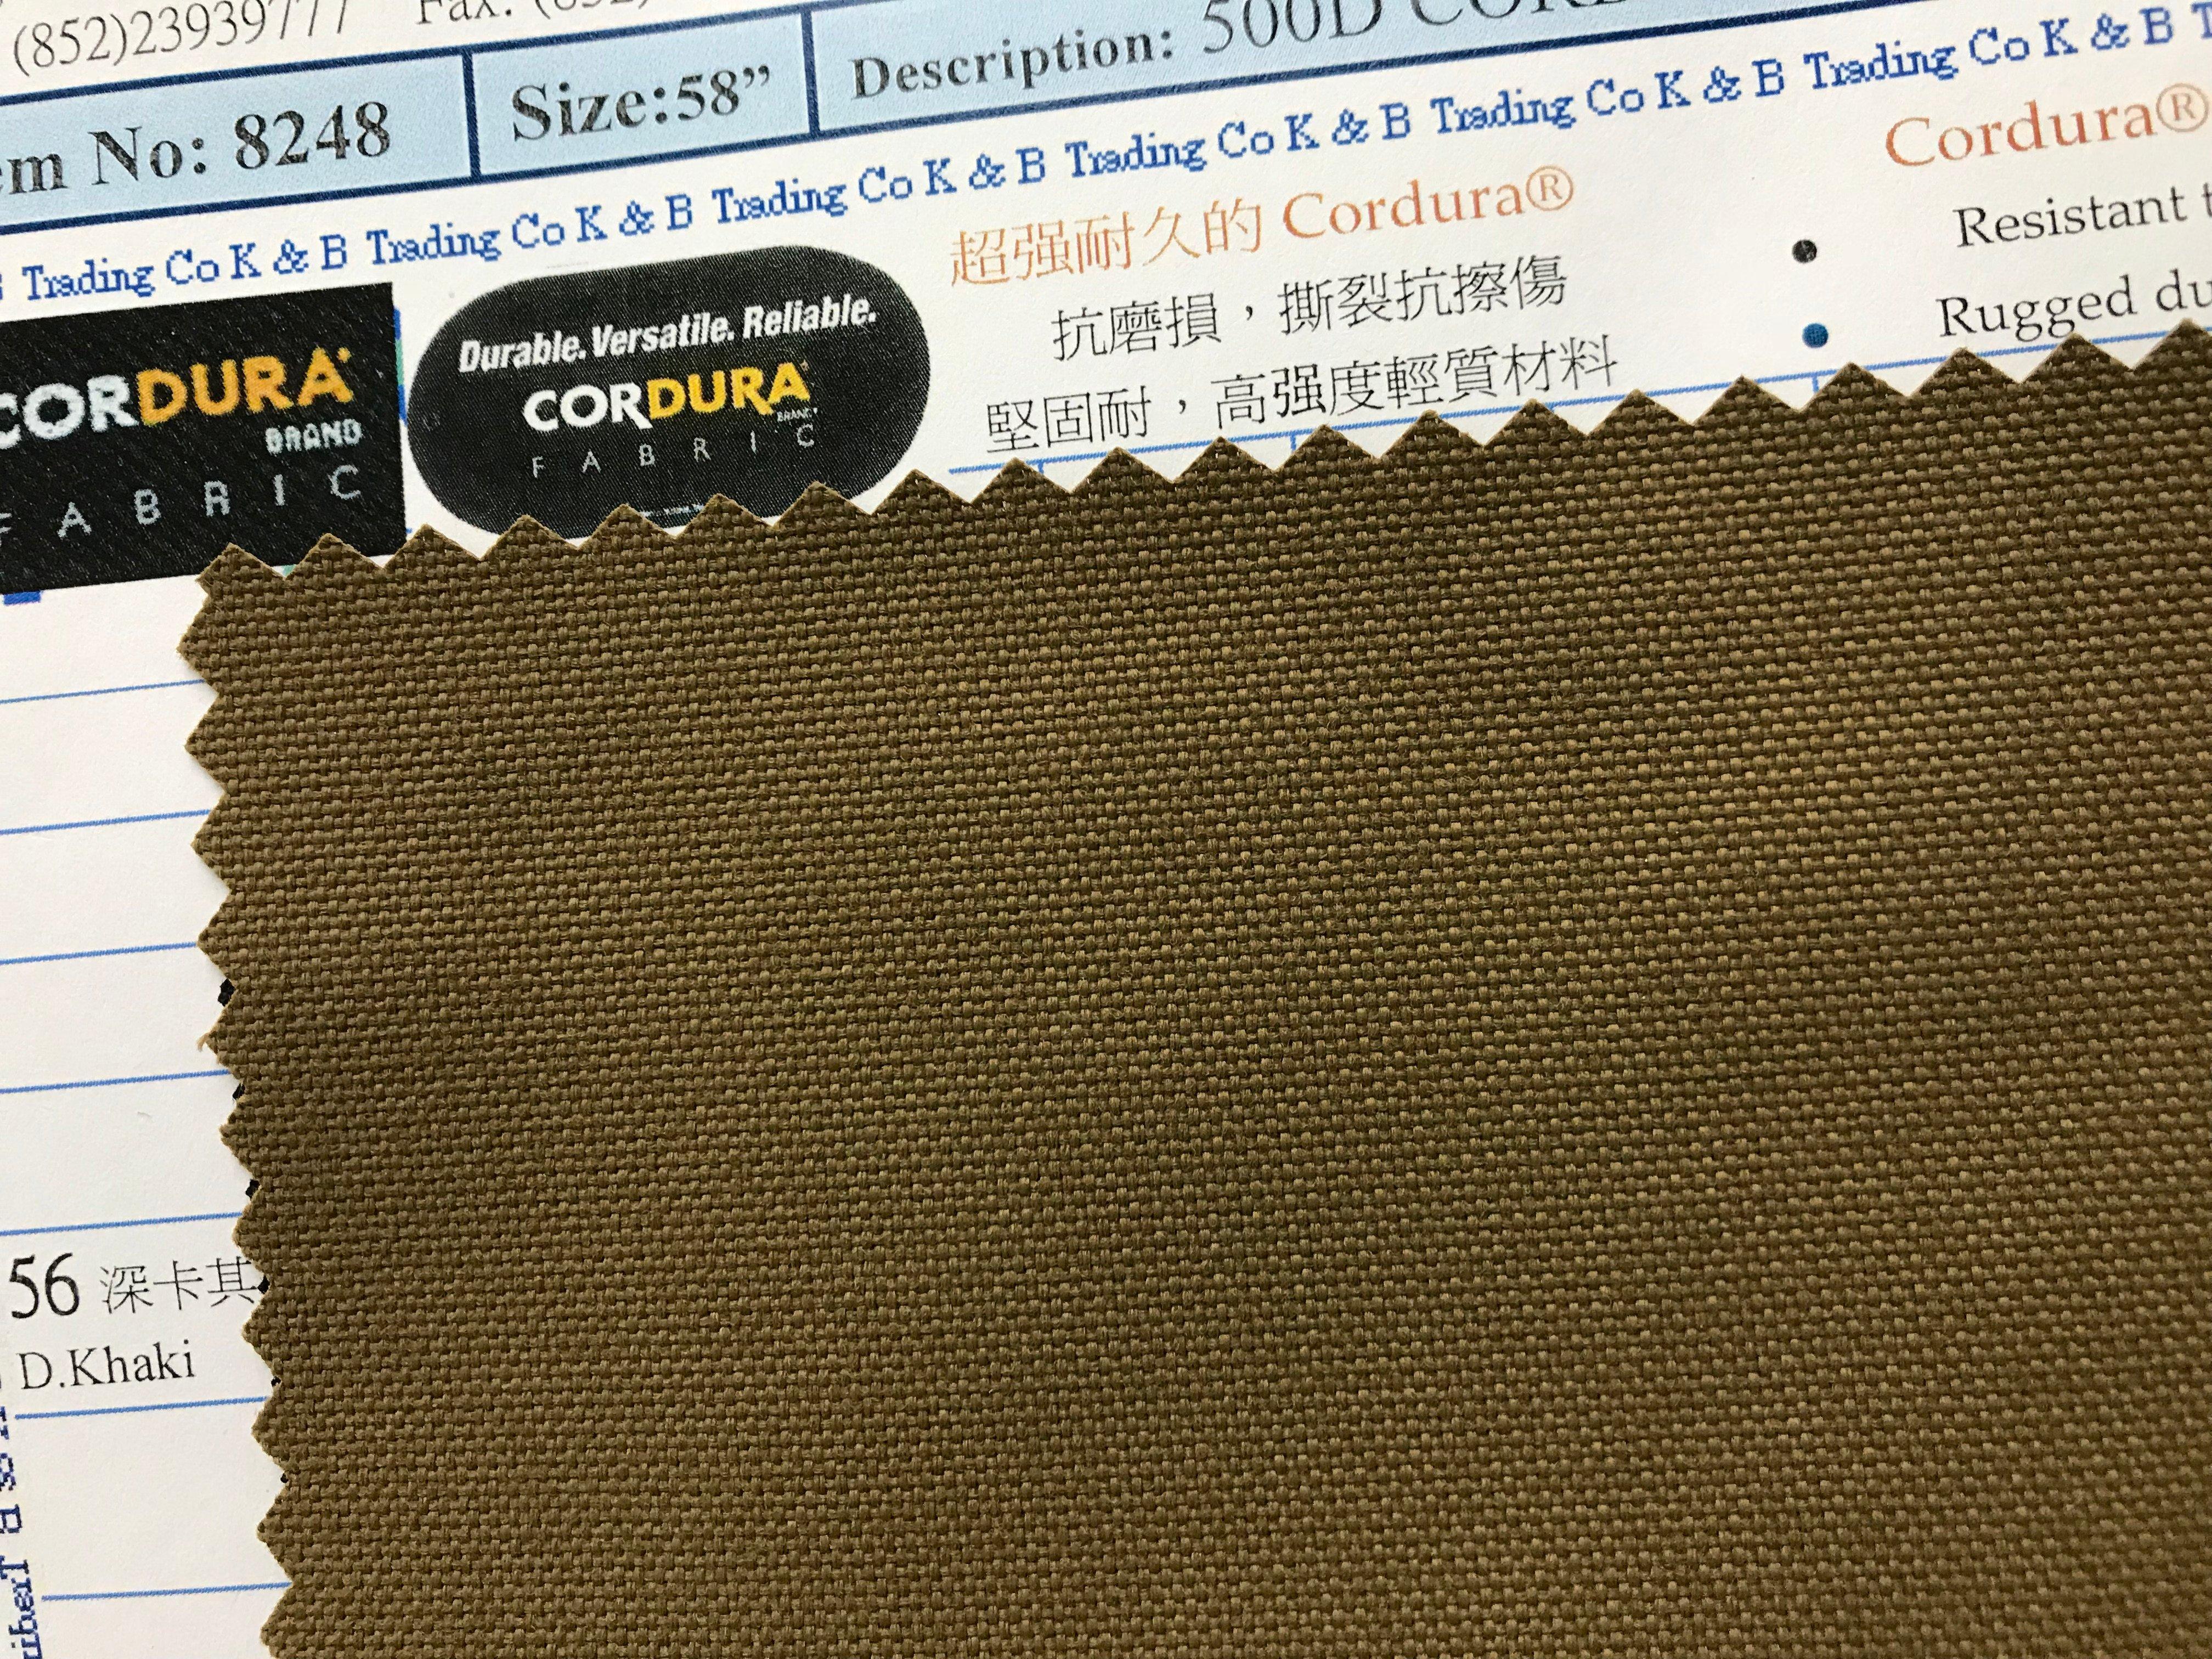 500d cordura fd with pu coating